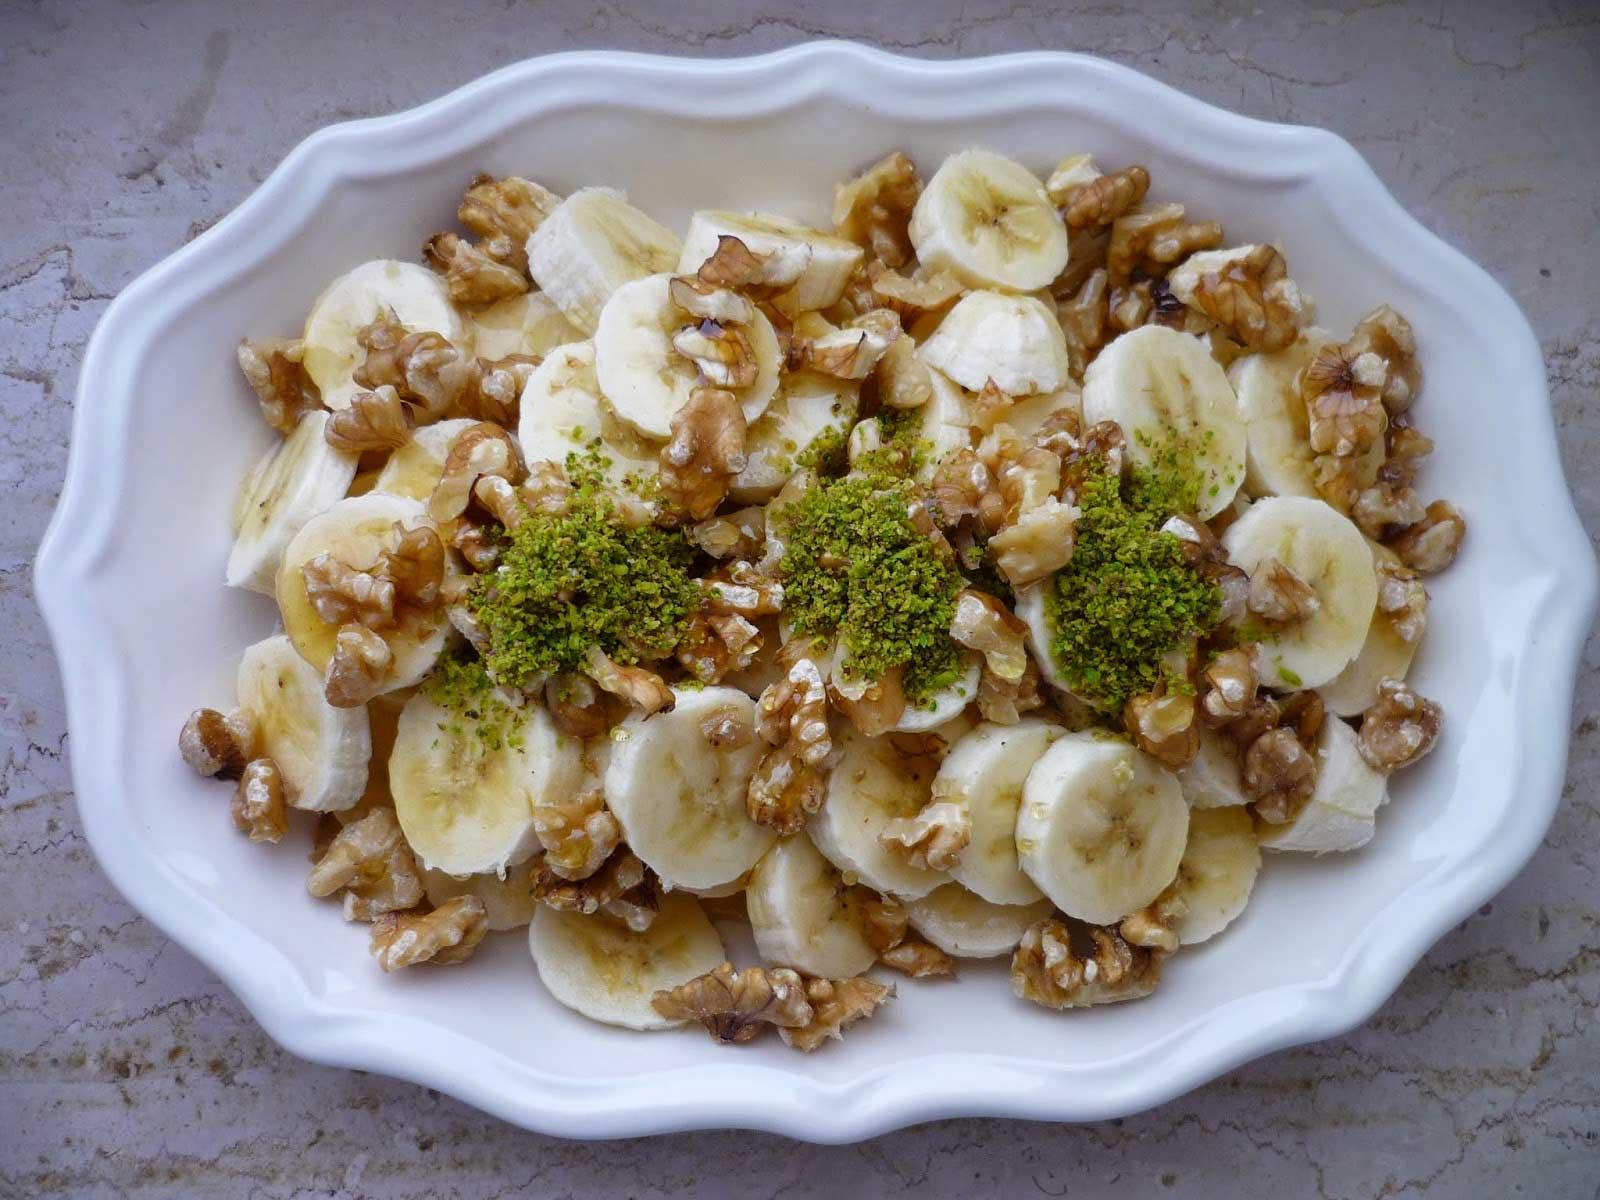 Dessert mit Honig, Walnüssen und Bananen - Ballı Cevizli Muz Tatlısı